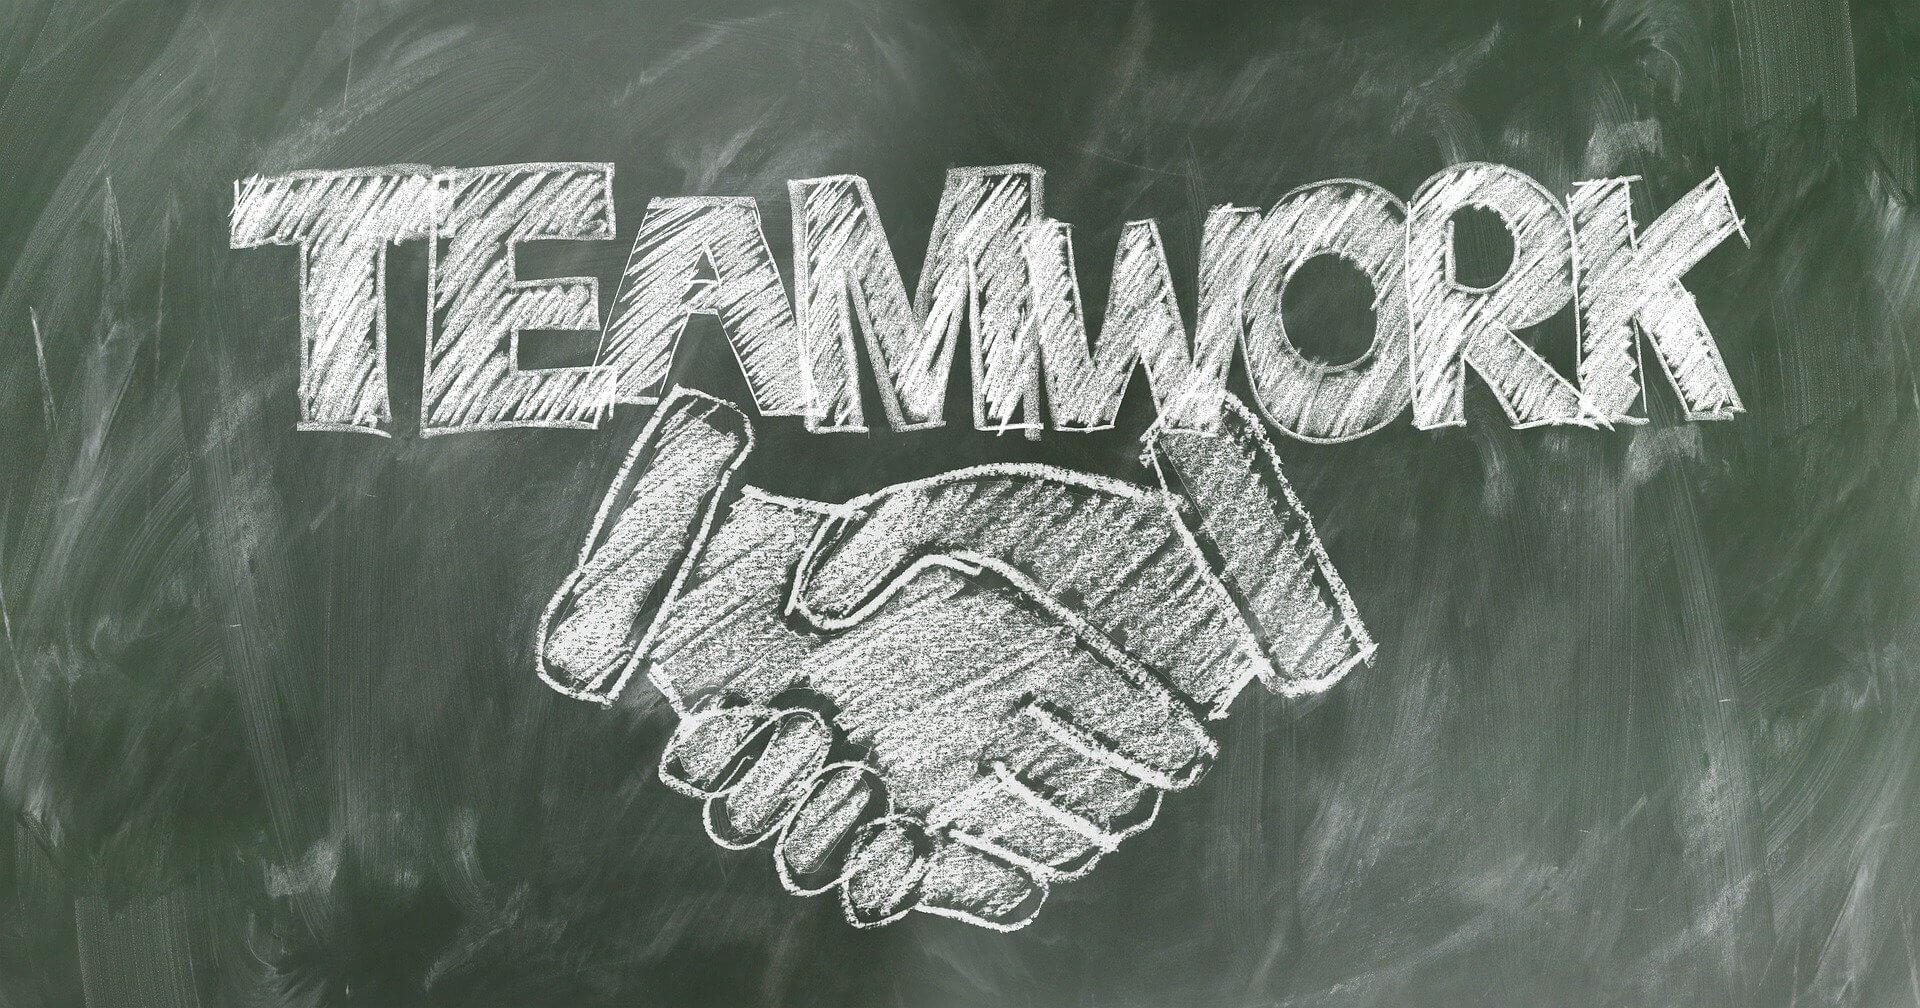 Image Teamwork